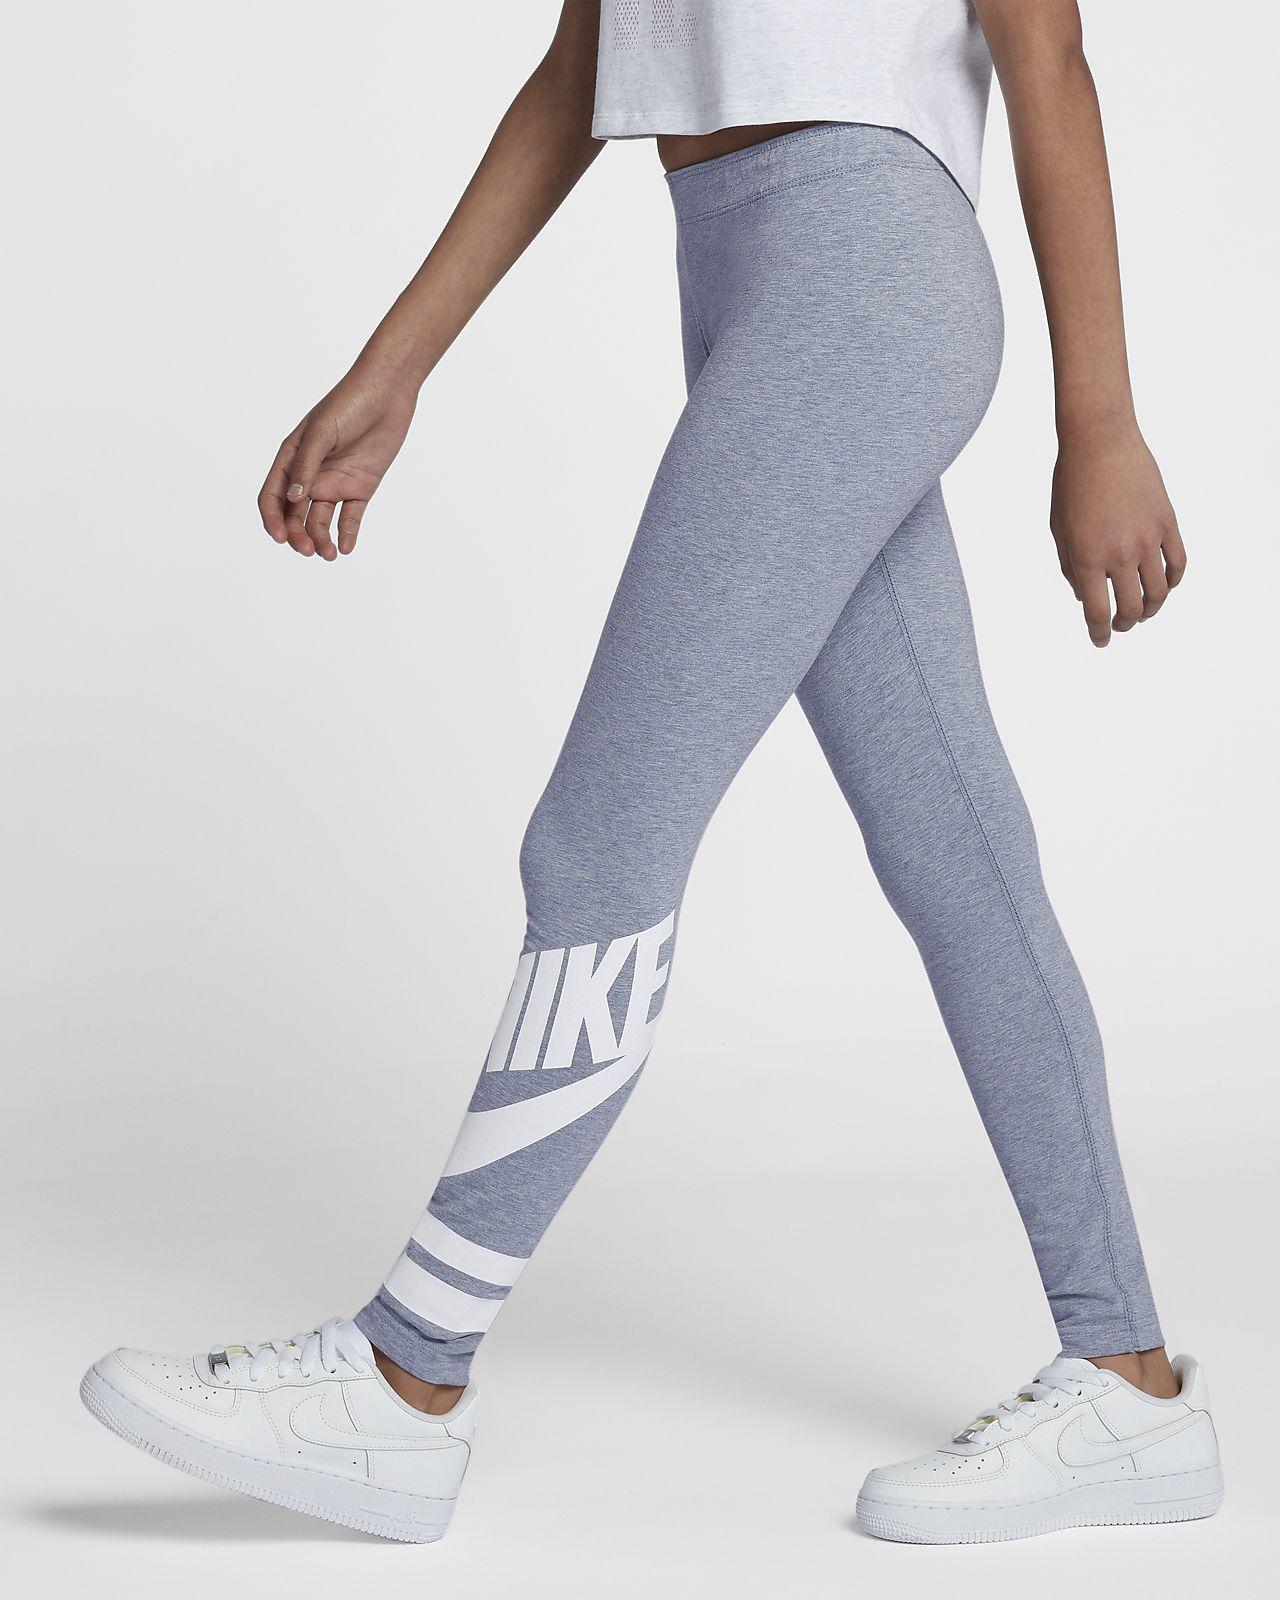 df24256223f95 Nike Sportswear Older Kids' (Girls') Graphic Leggings. Nike.com CA